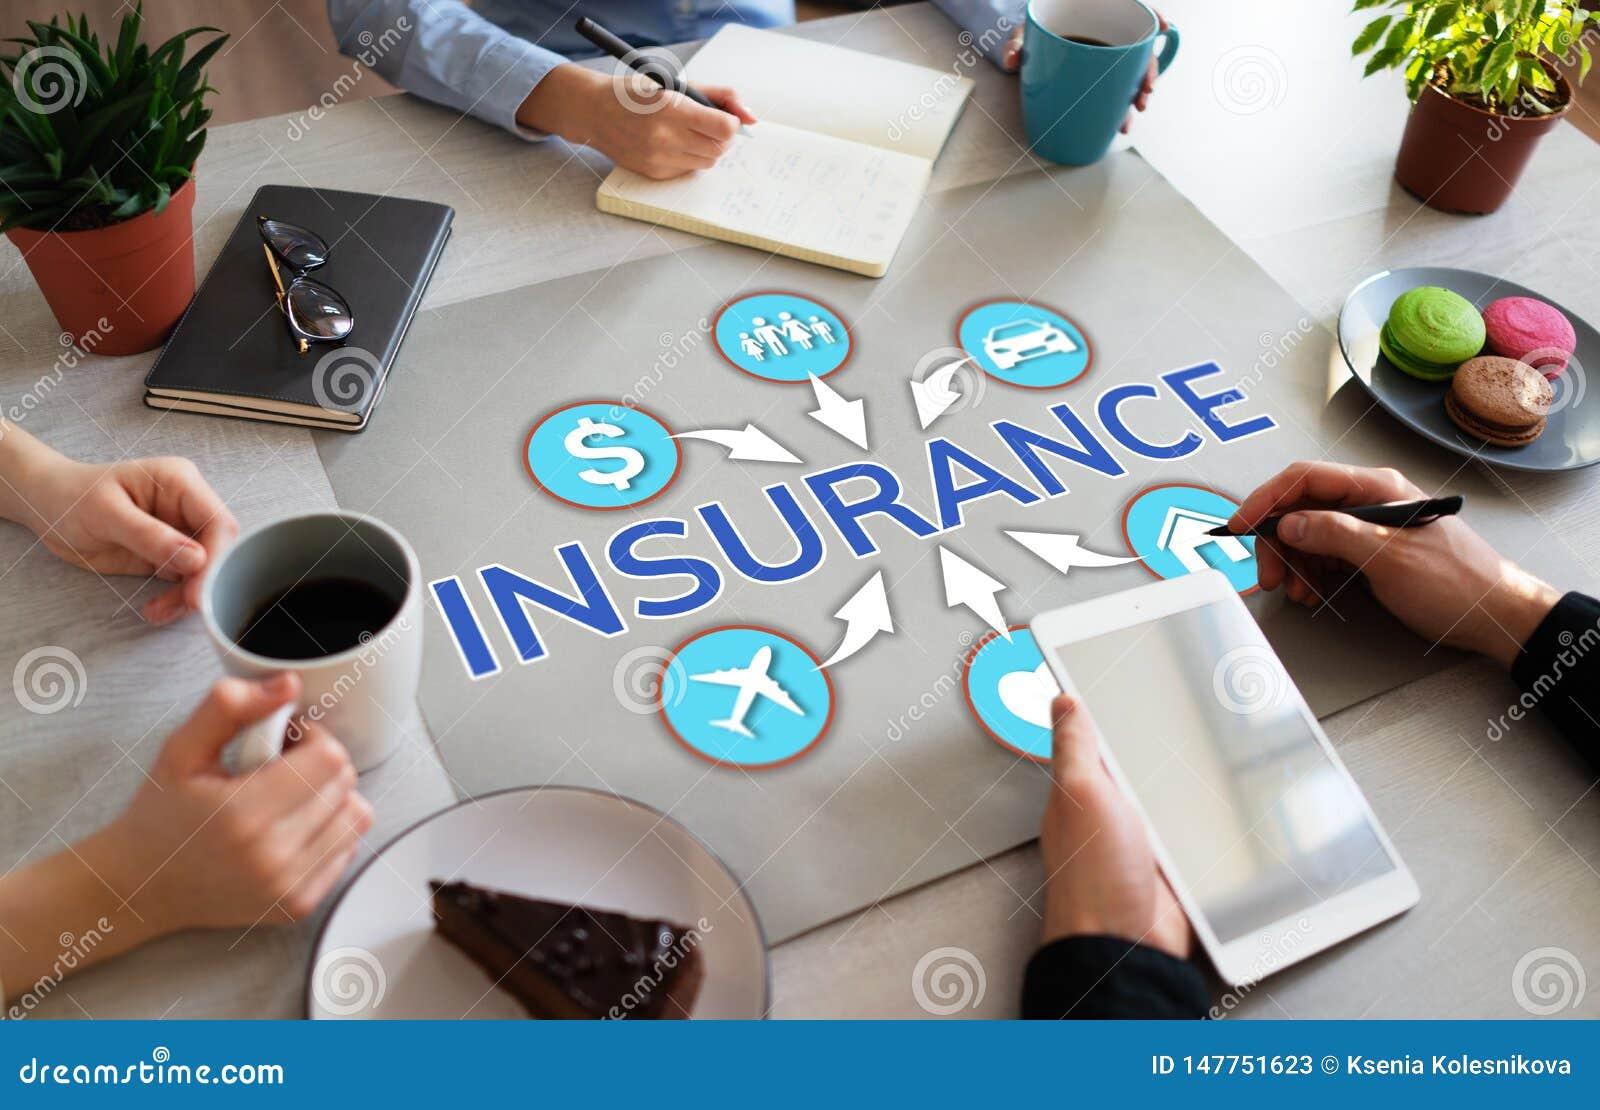 Insurance concept on office desktop life health care money travel.